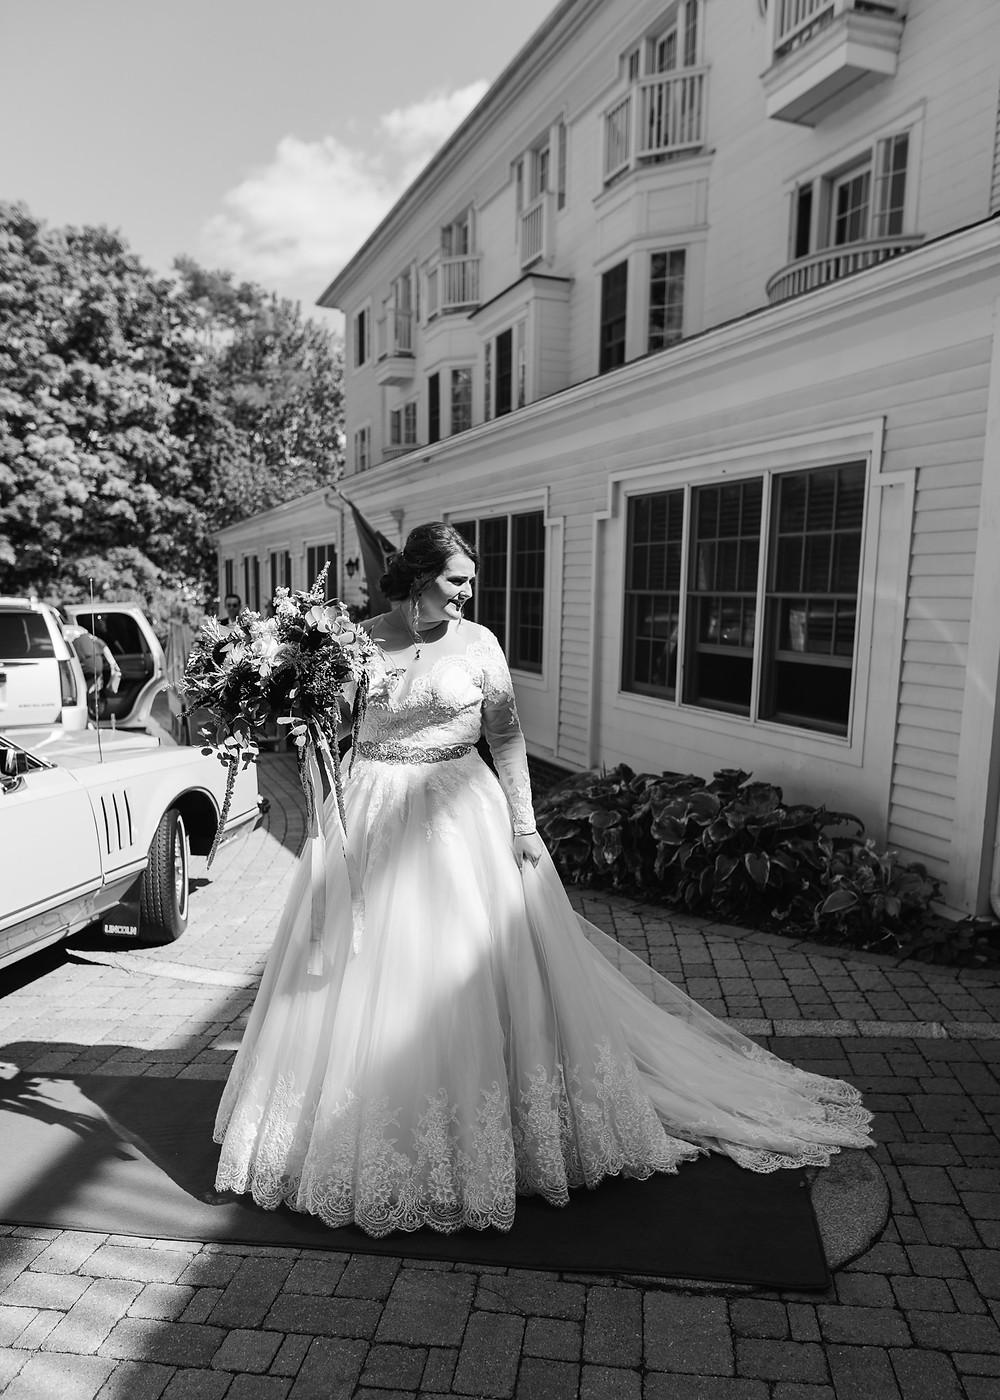 Daniel Boon in during Brunswick, Maine wedding photography